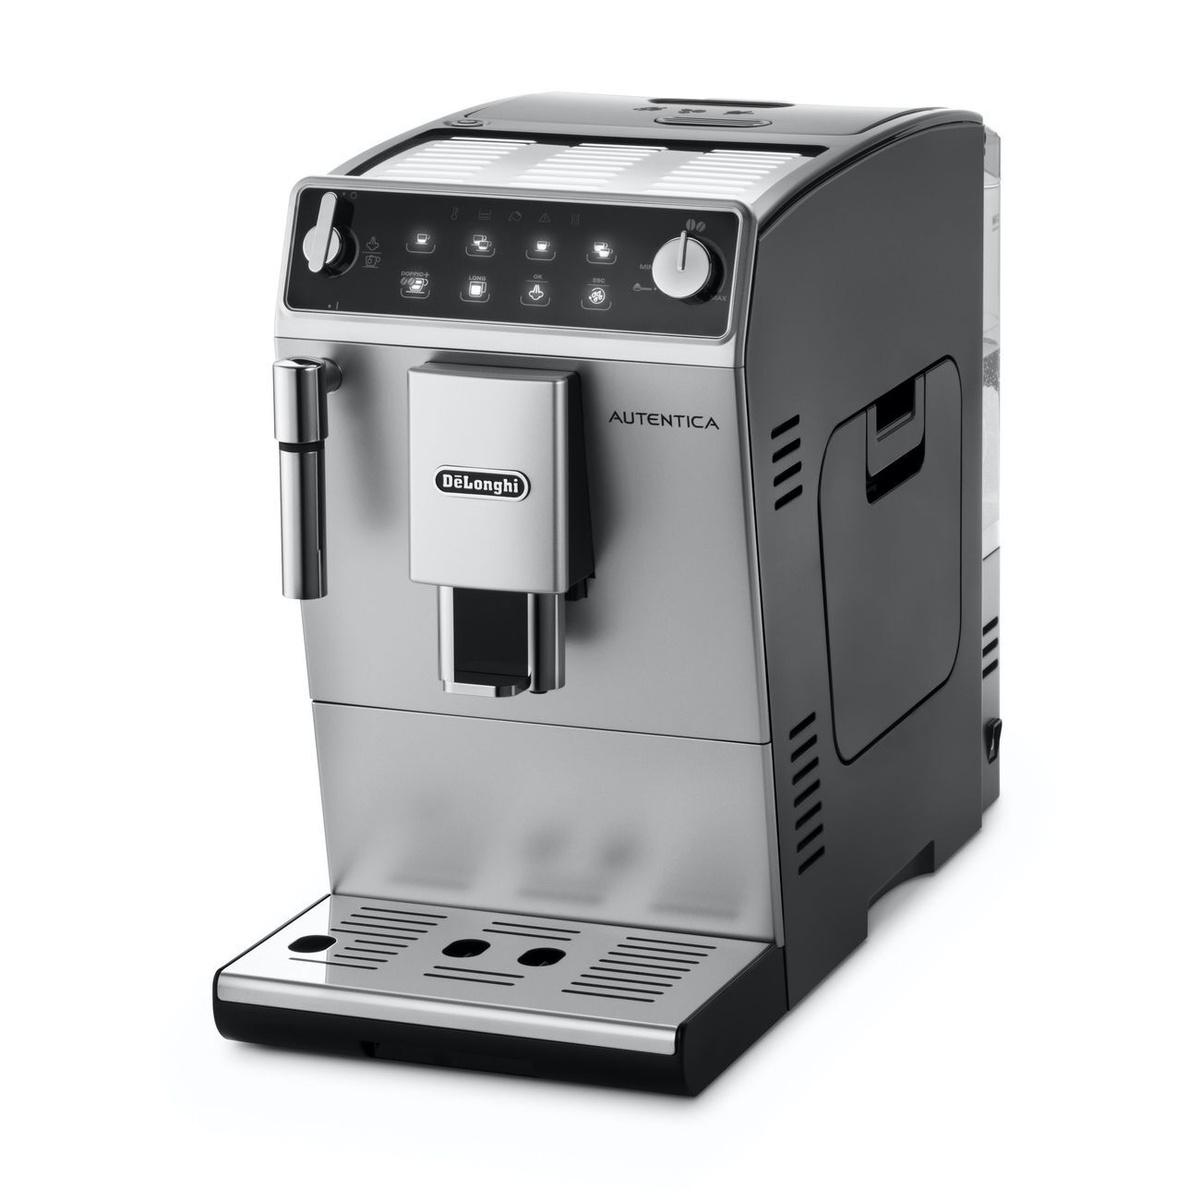 Кофеварка / кофемашина DeLonghi Autentica ETAM 29.510.SB